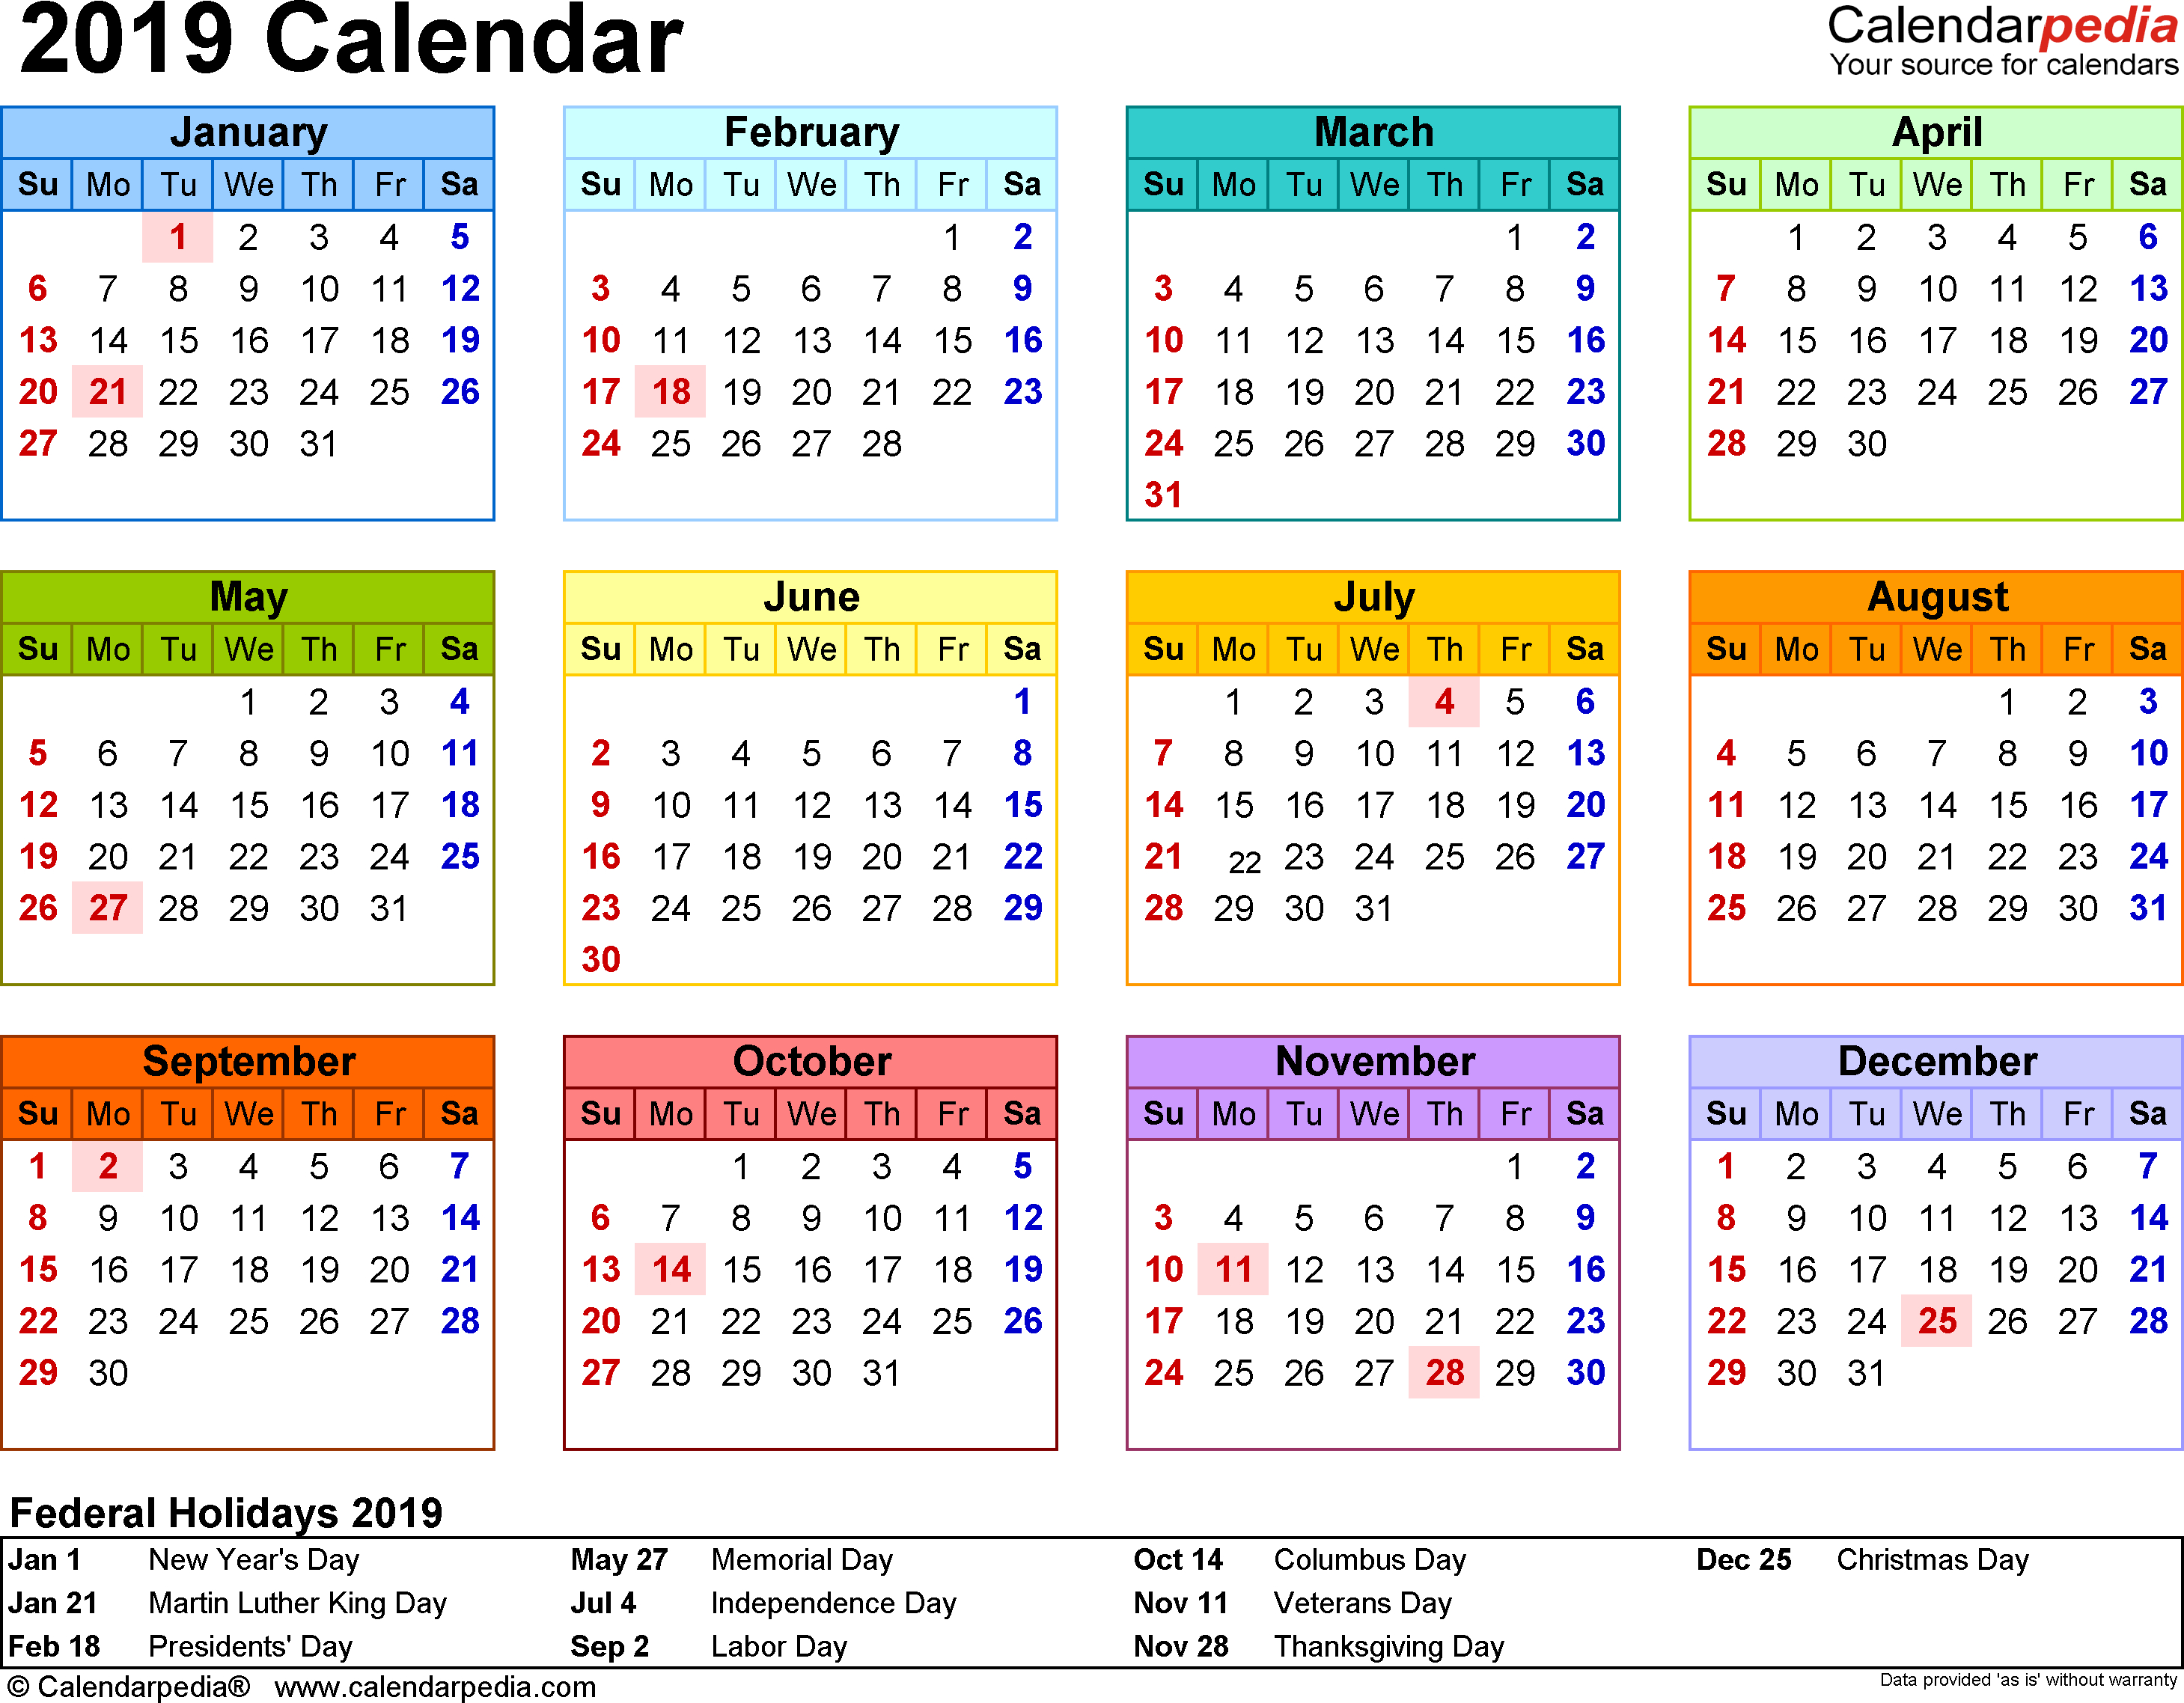 2019 Calendar - 17 Free Printable Word Calendar Templates for Word Calendar Template Excel